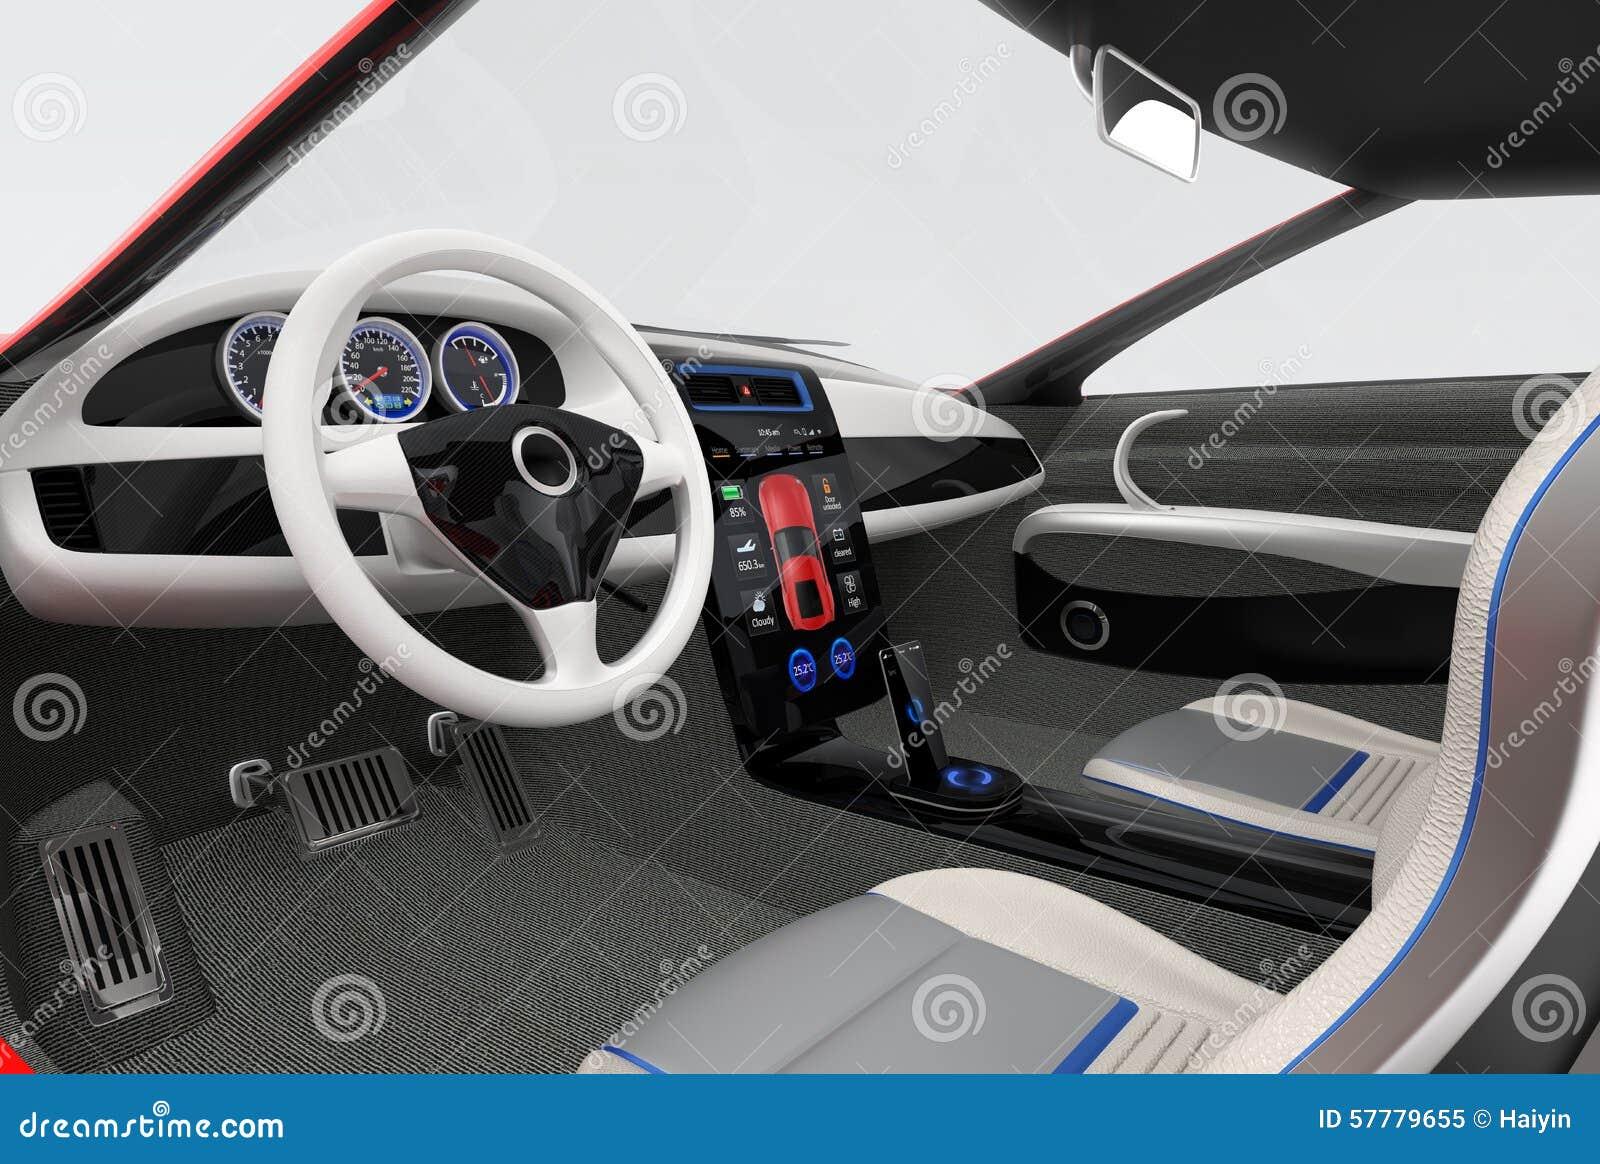 Futuristic Electric Vehicle Dashboard And Interior Design Stock